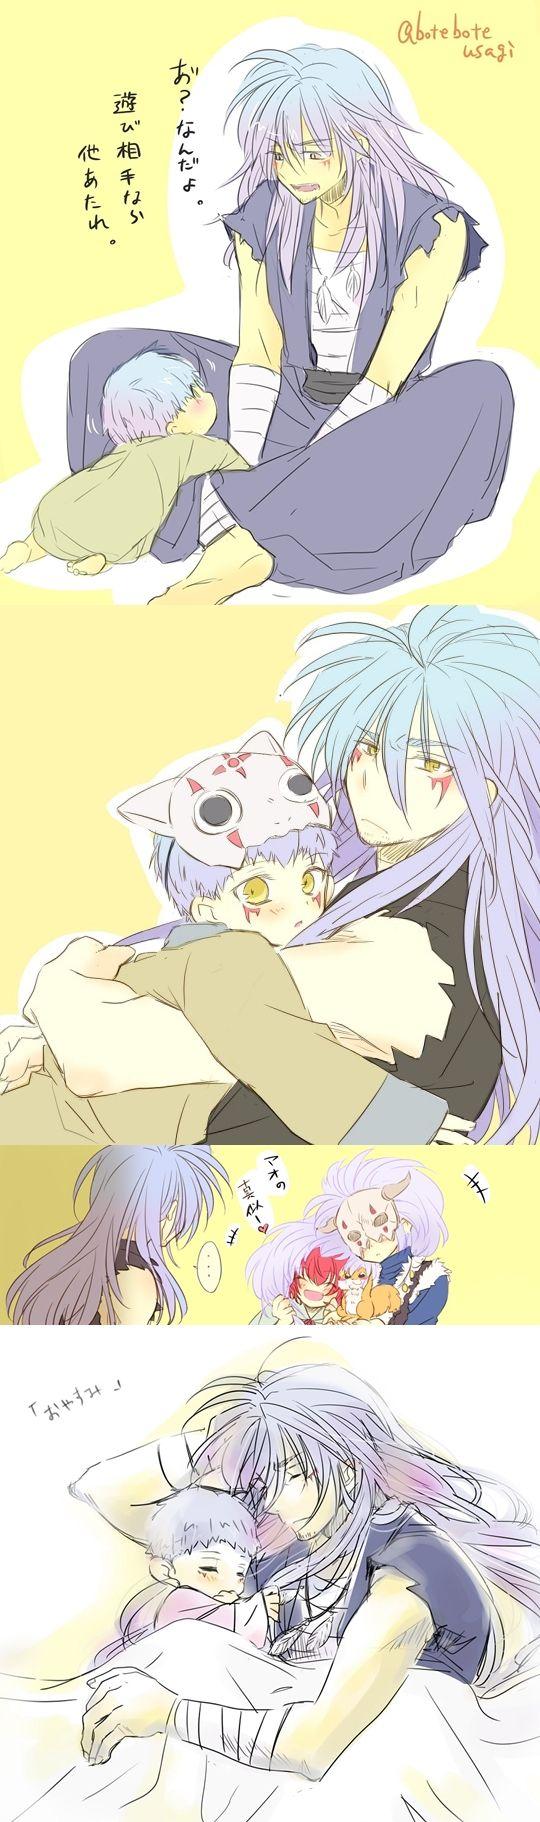 Ao and little Shin-Ah ~ Akatsuki no Yona // I can't even begin to describe how much I love Ao ♡